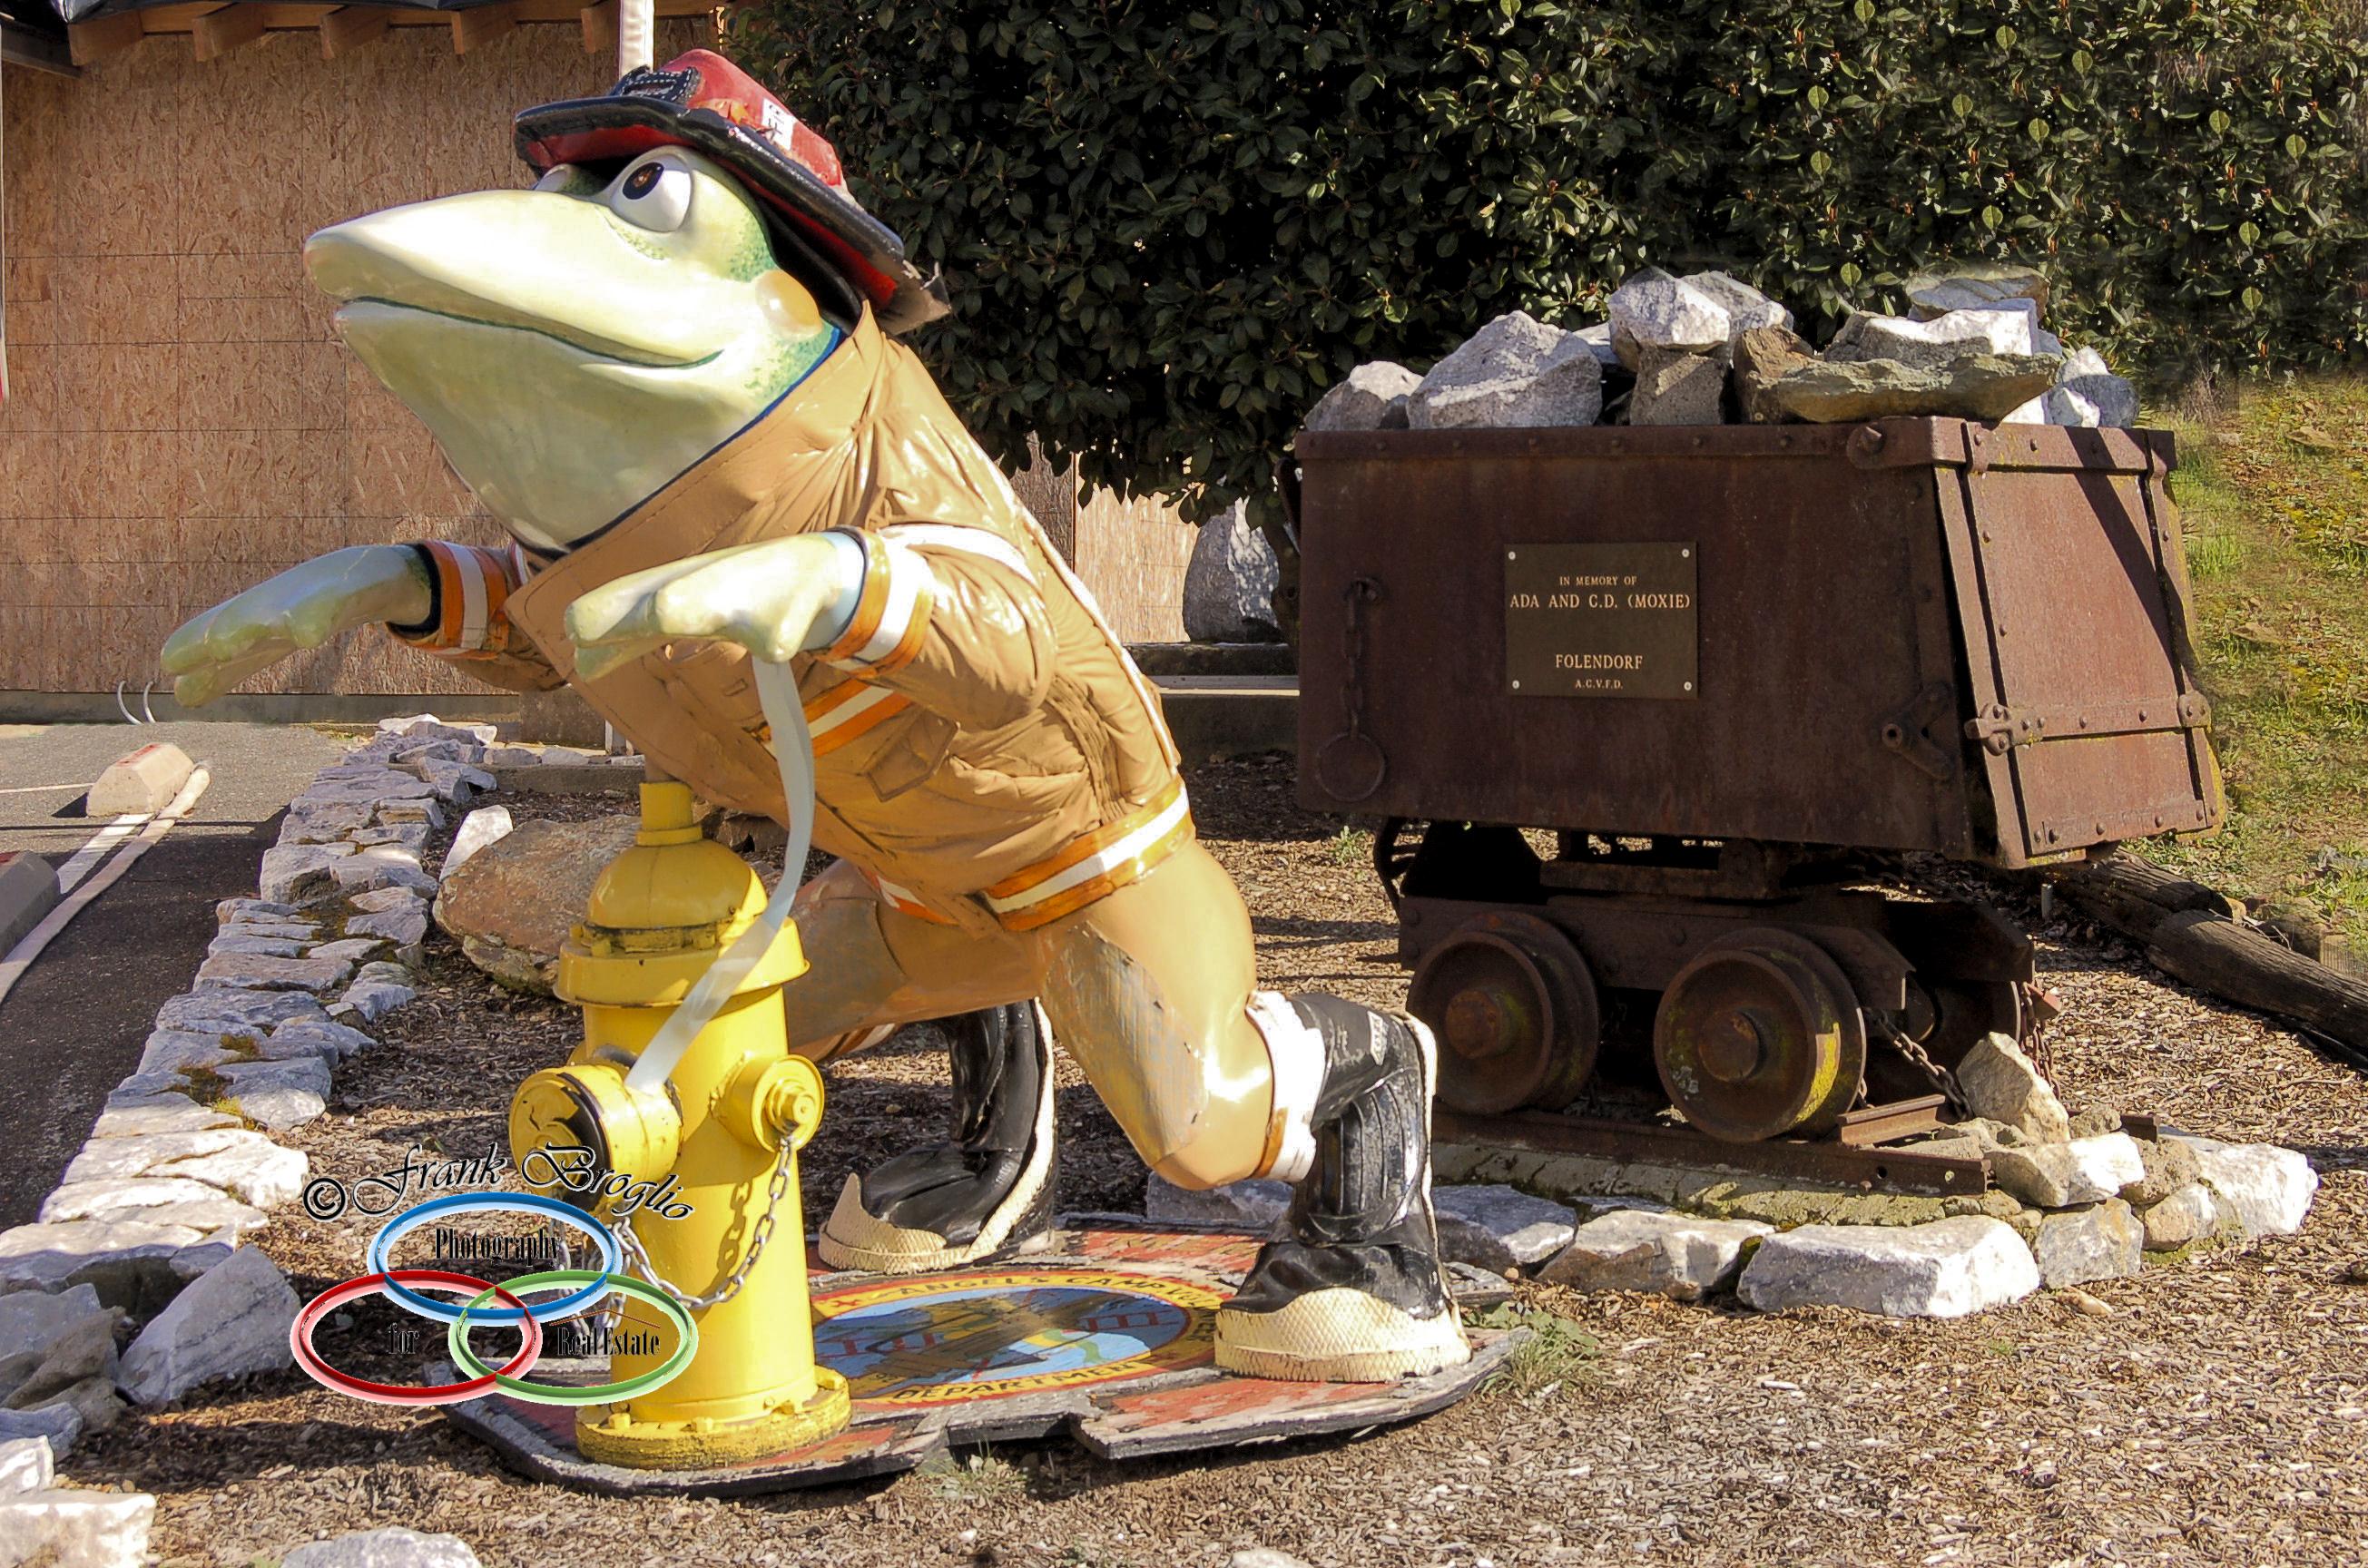 Volunteer Fireman (Frog)